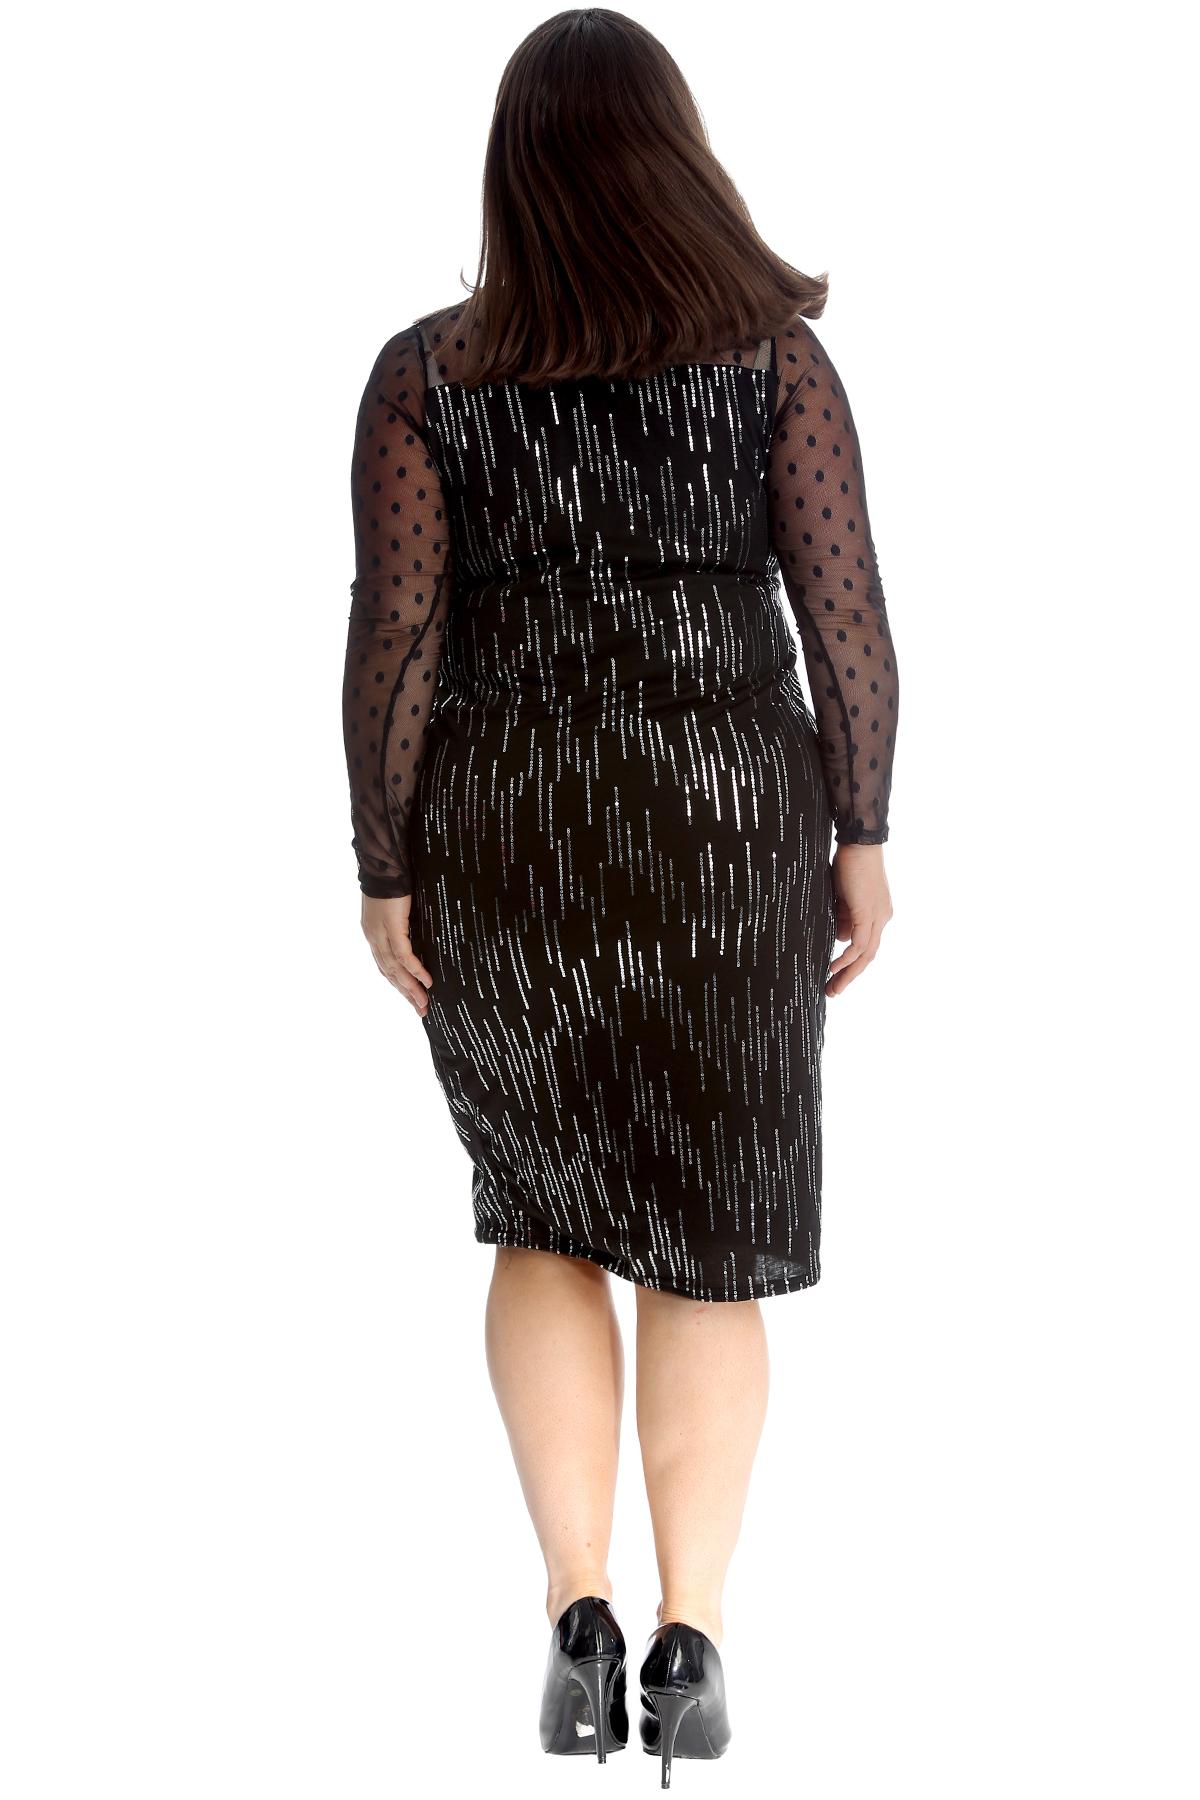 Neu Damen Übergröße Kleid Frauen Midi Bodycon Chiffon ...